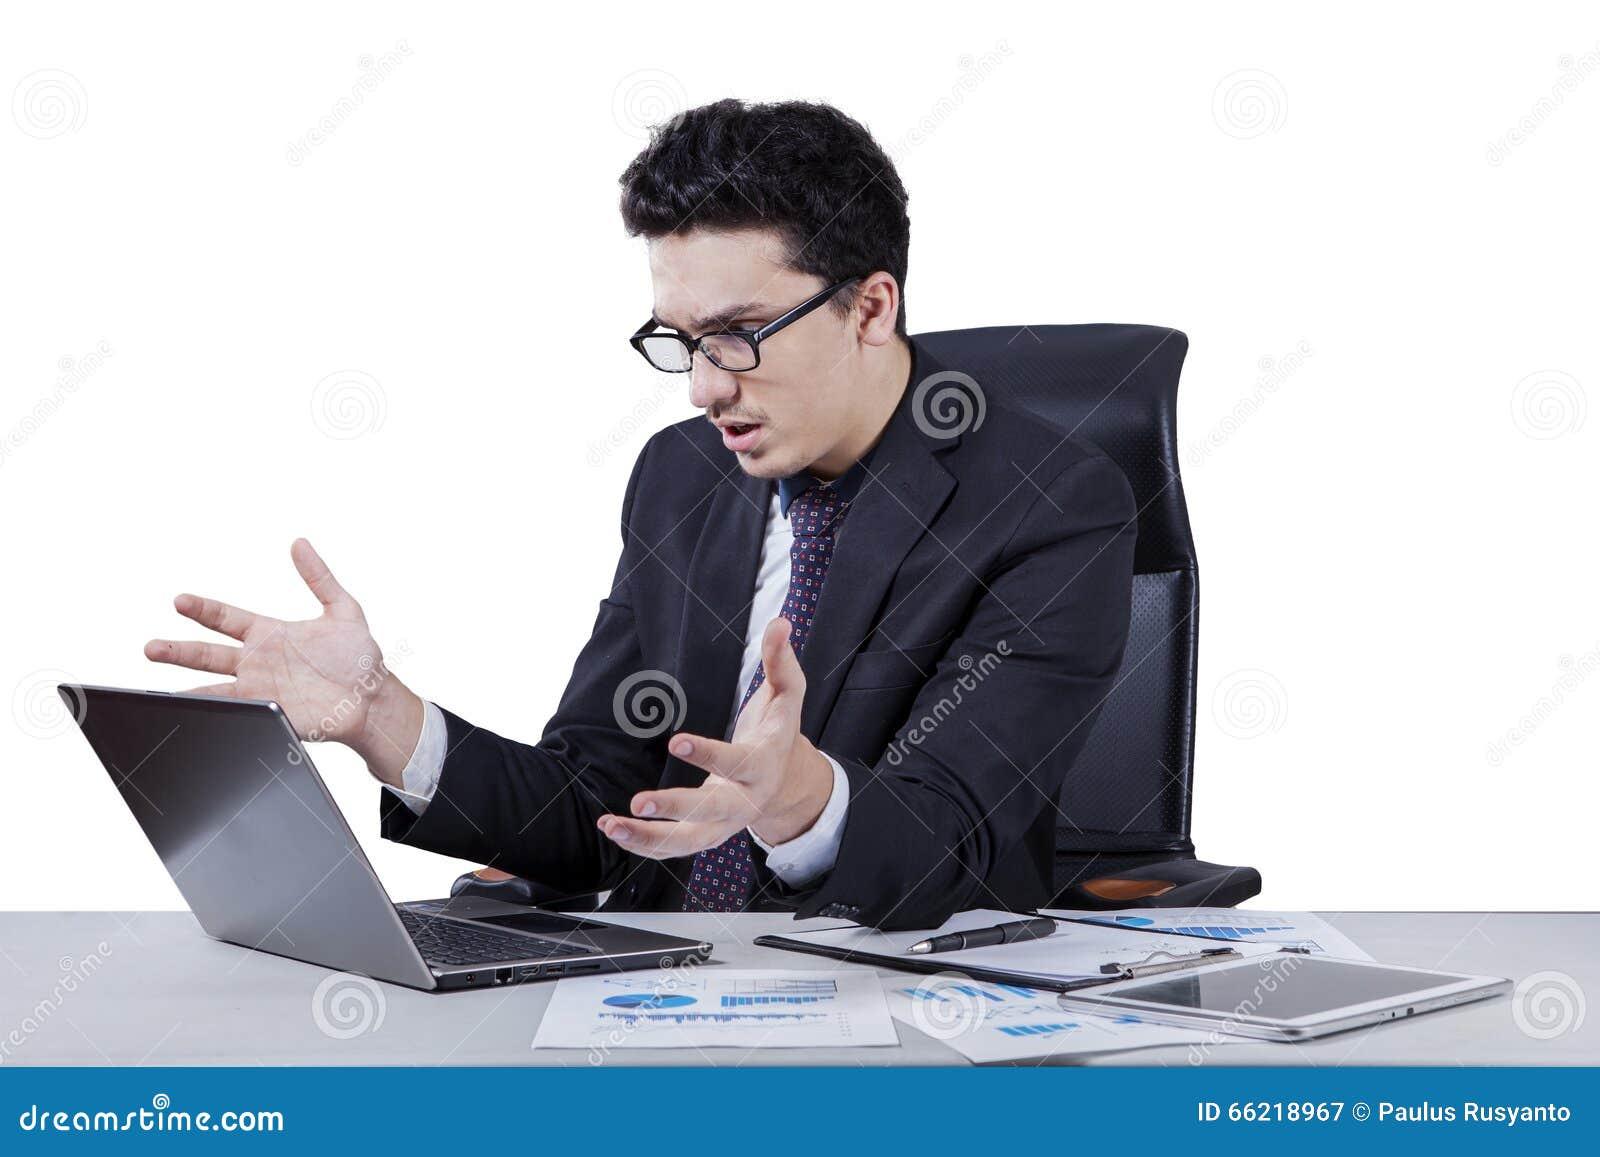 Surprised middle eastern worker looking at laptop